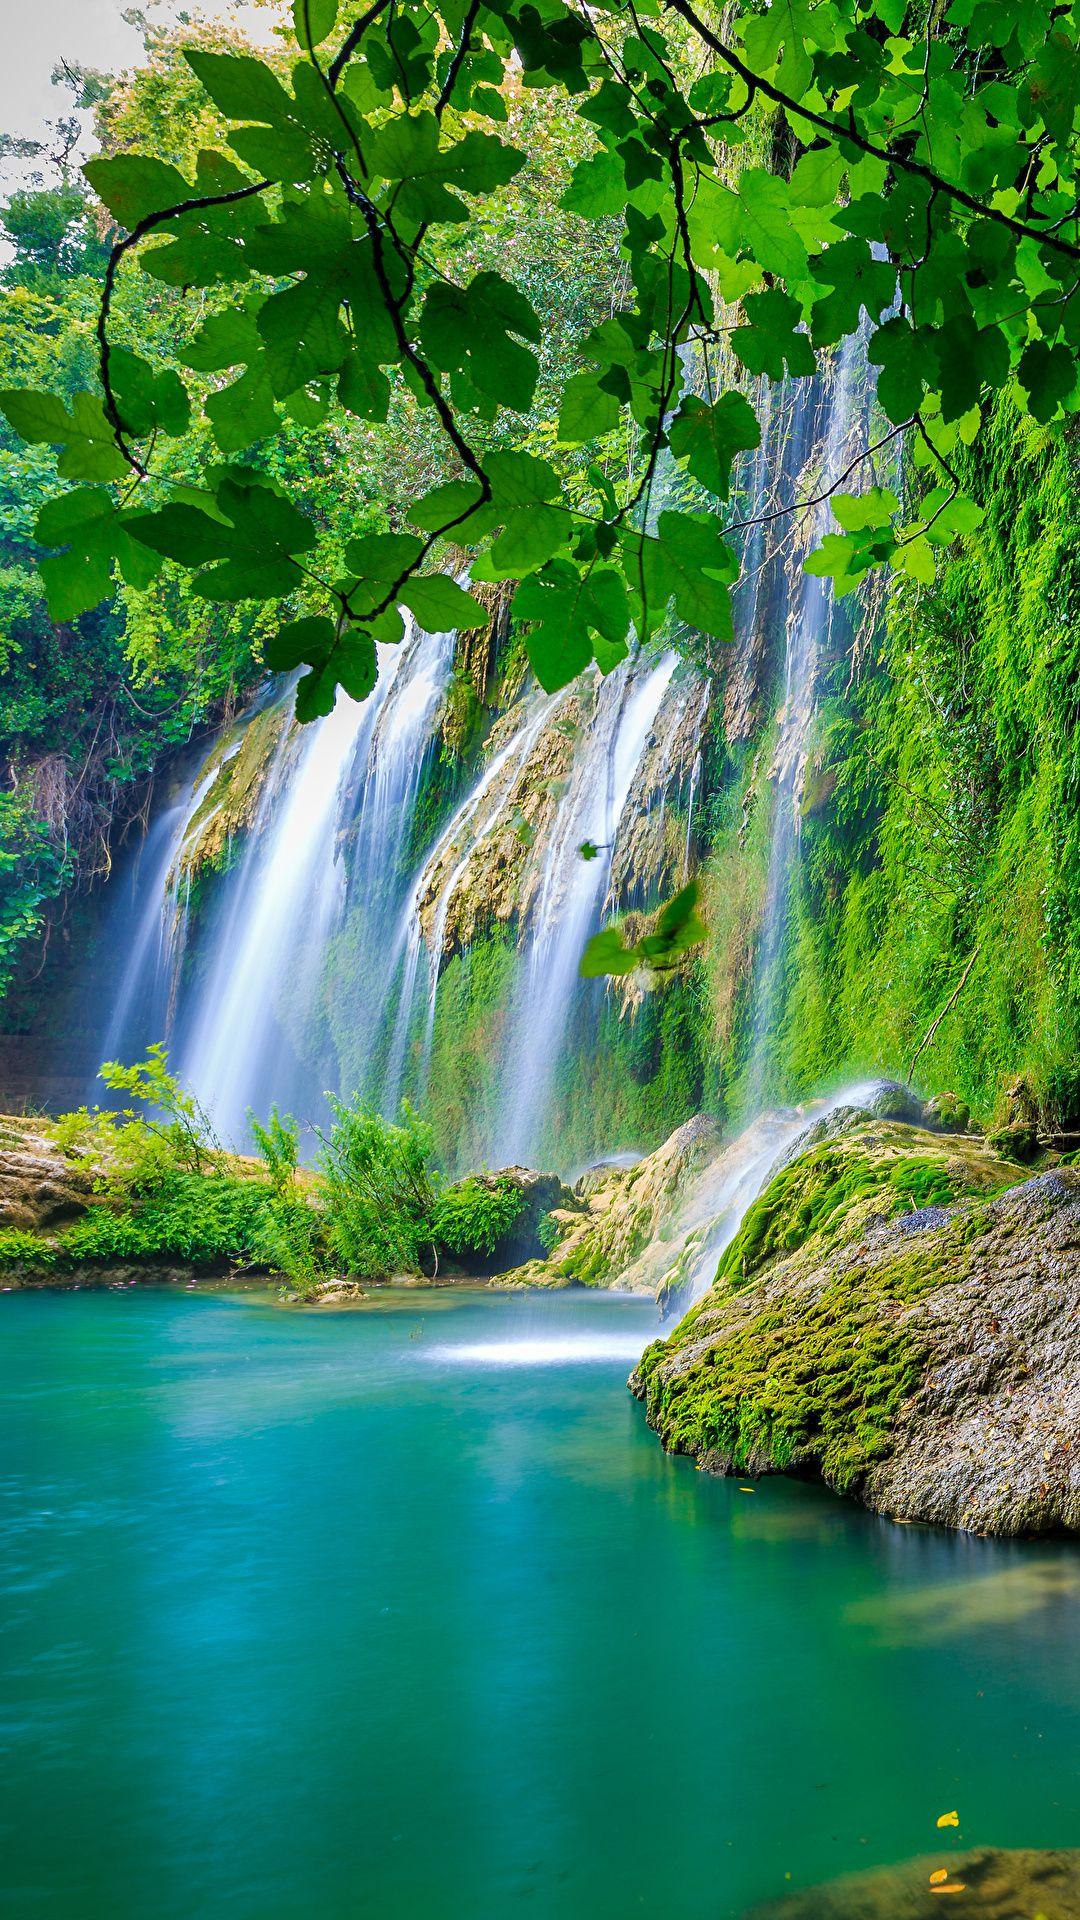 Wallpapers Nature Waterfalls Moss